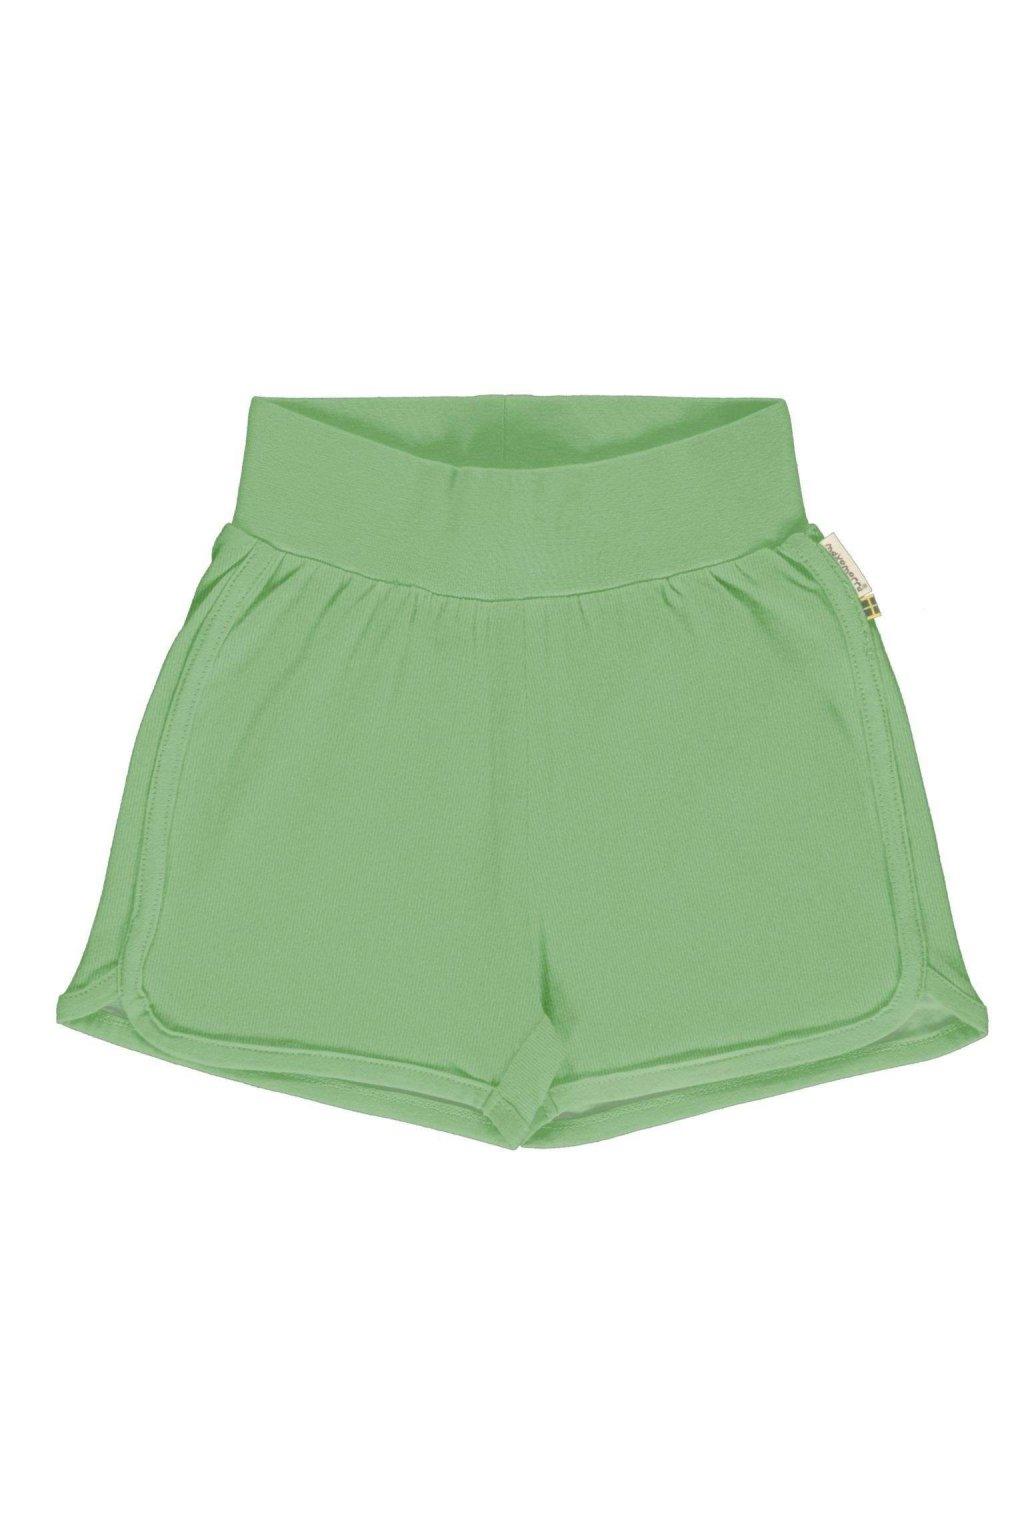 detske kratasy zelene greengage meyadey (1)